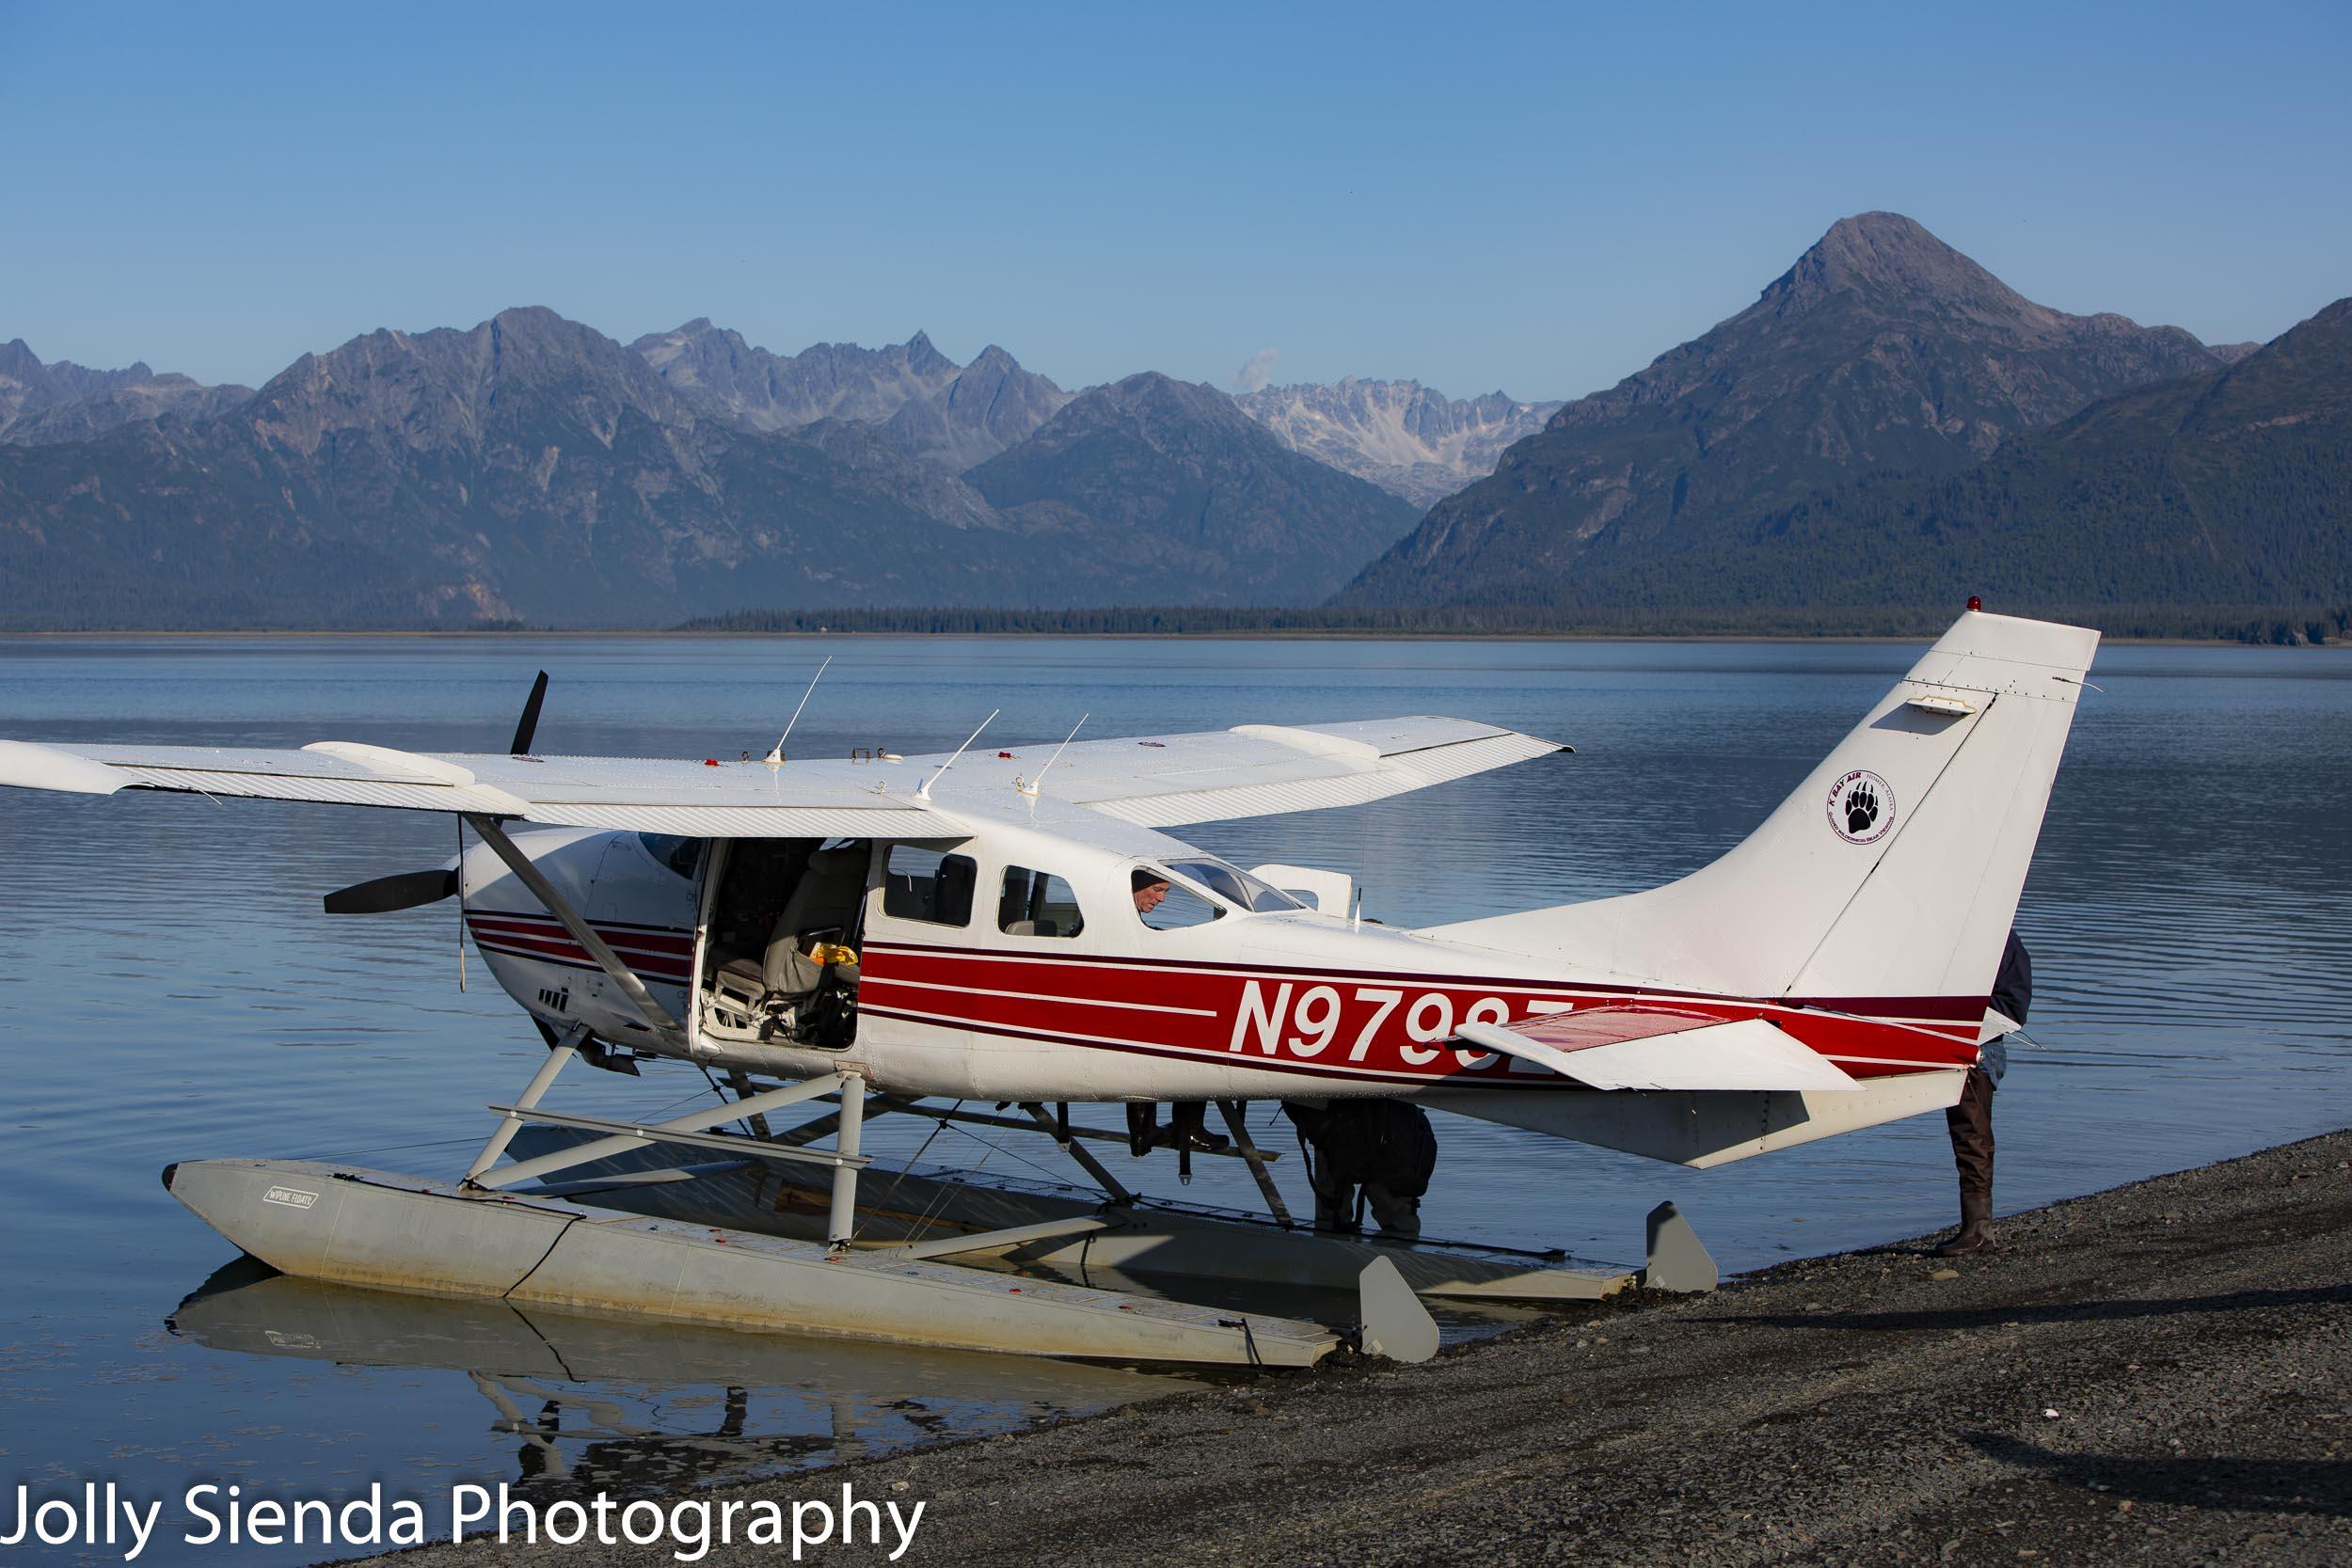 Arrived at Kachemak Bay via a float plane by courtesy of Alaska Bear Adventures